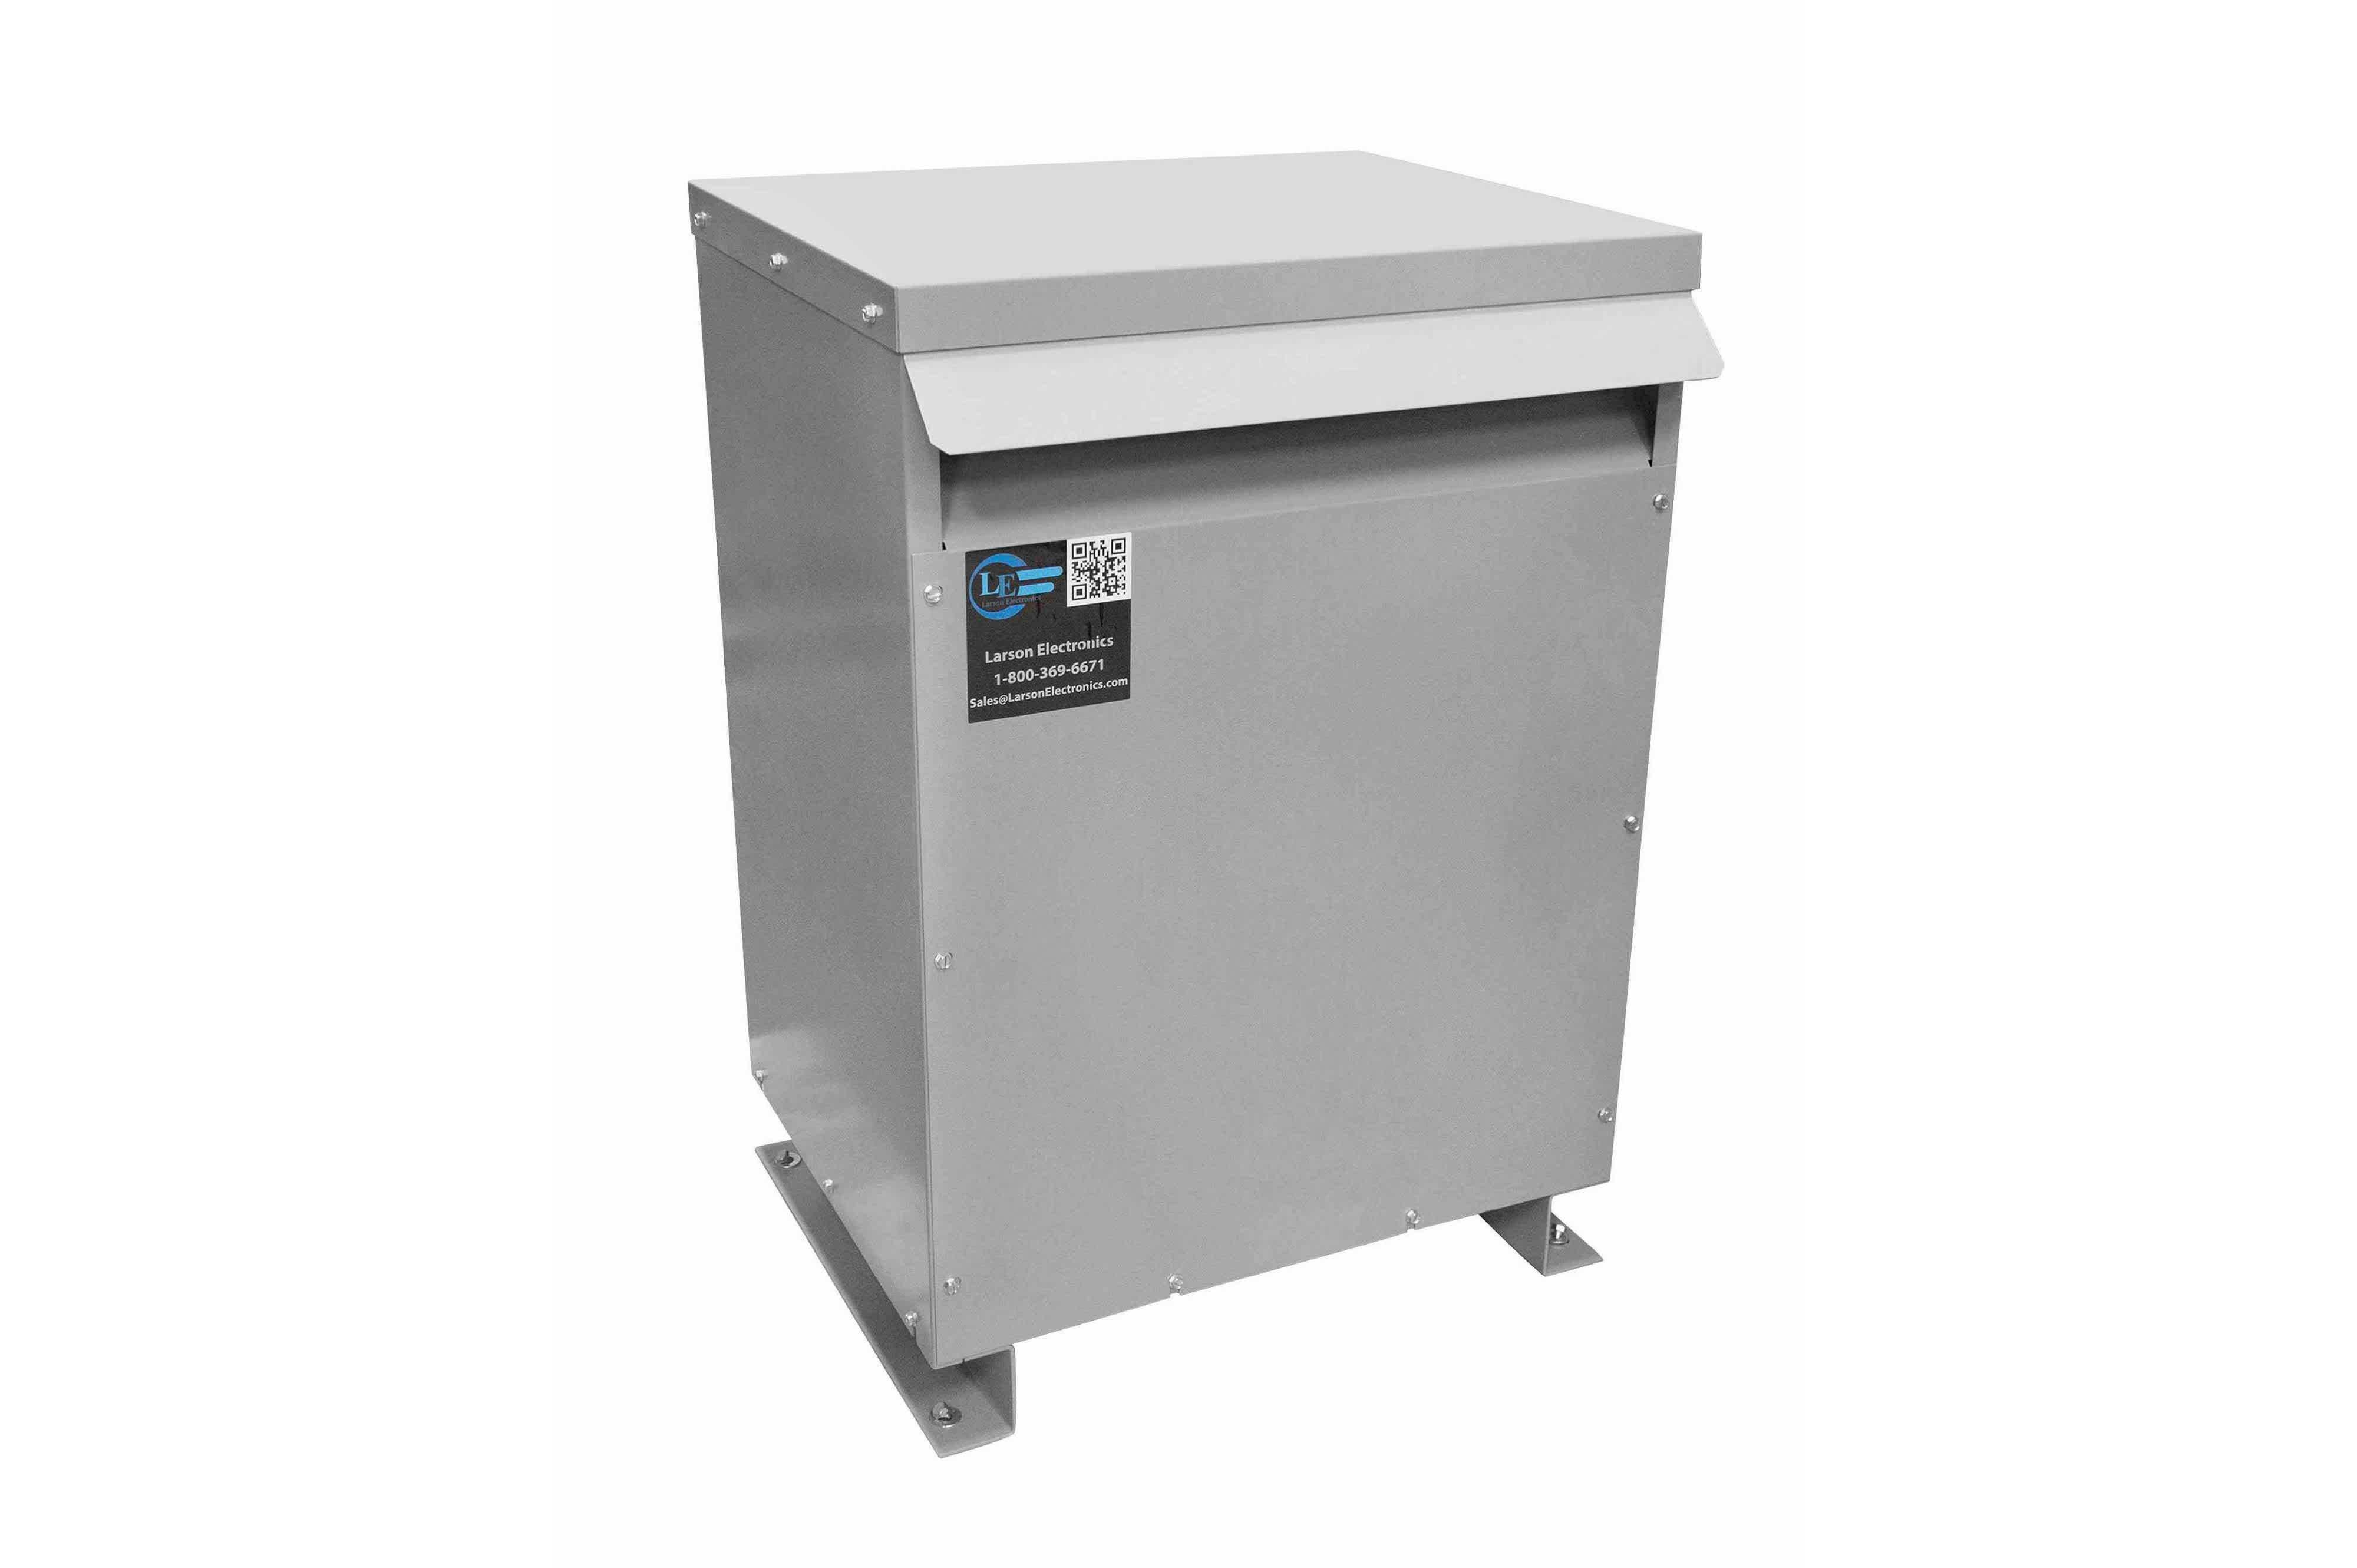 75 kVA 3PH Isolation Transformer, 480V Wye Primary, 380V Delta Secondary, N3R, Ventilated, 60 Hz